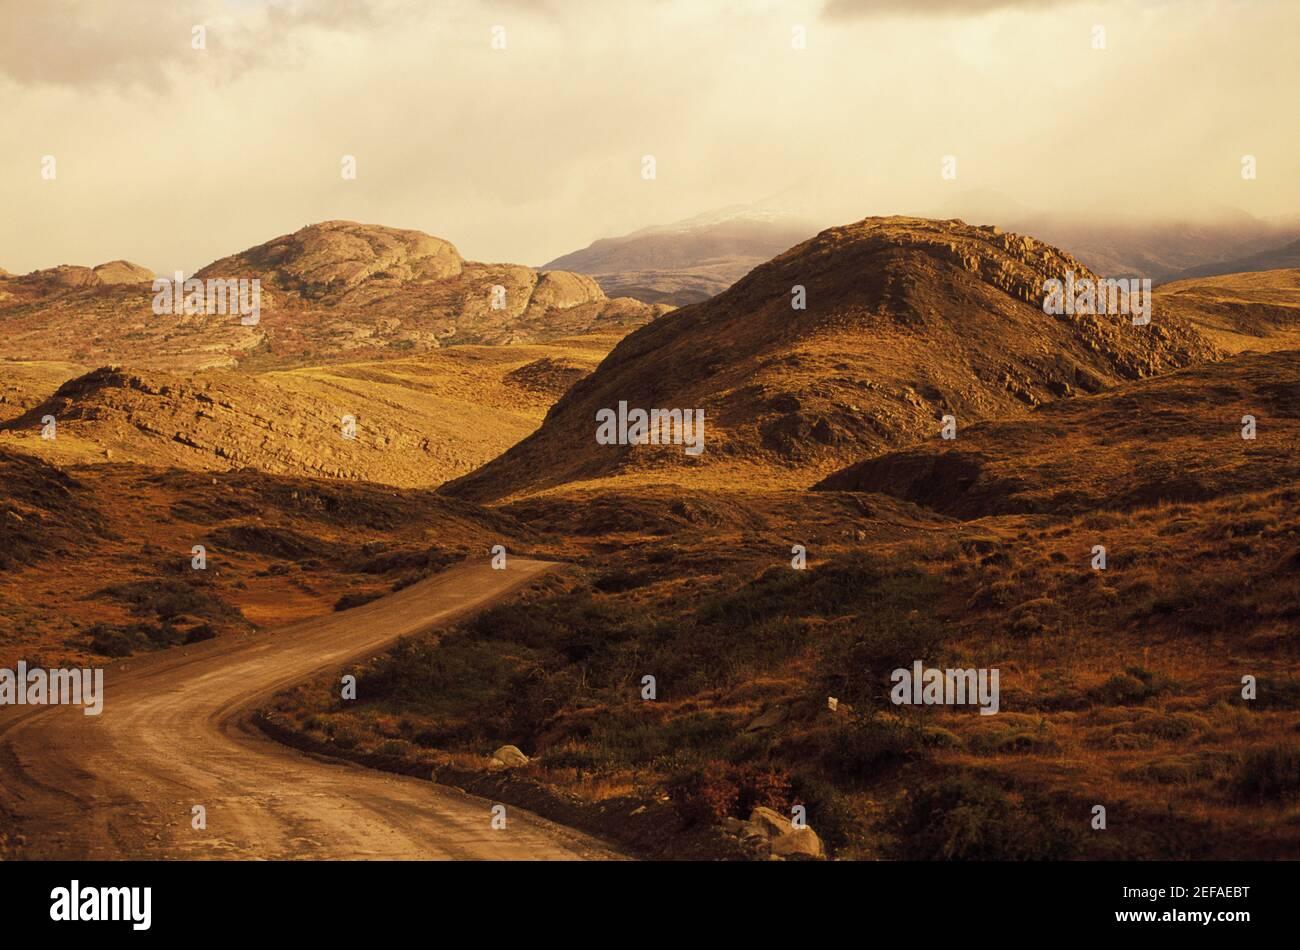 Dirt road through a landscape Stock Photo